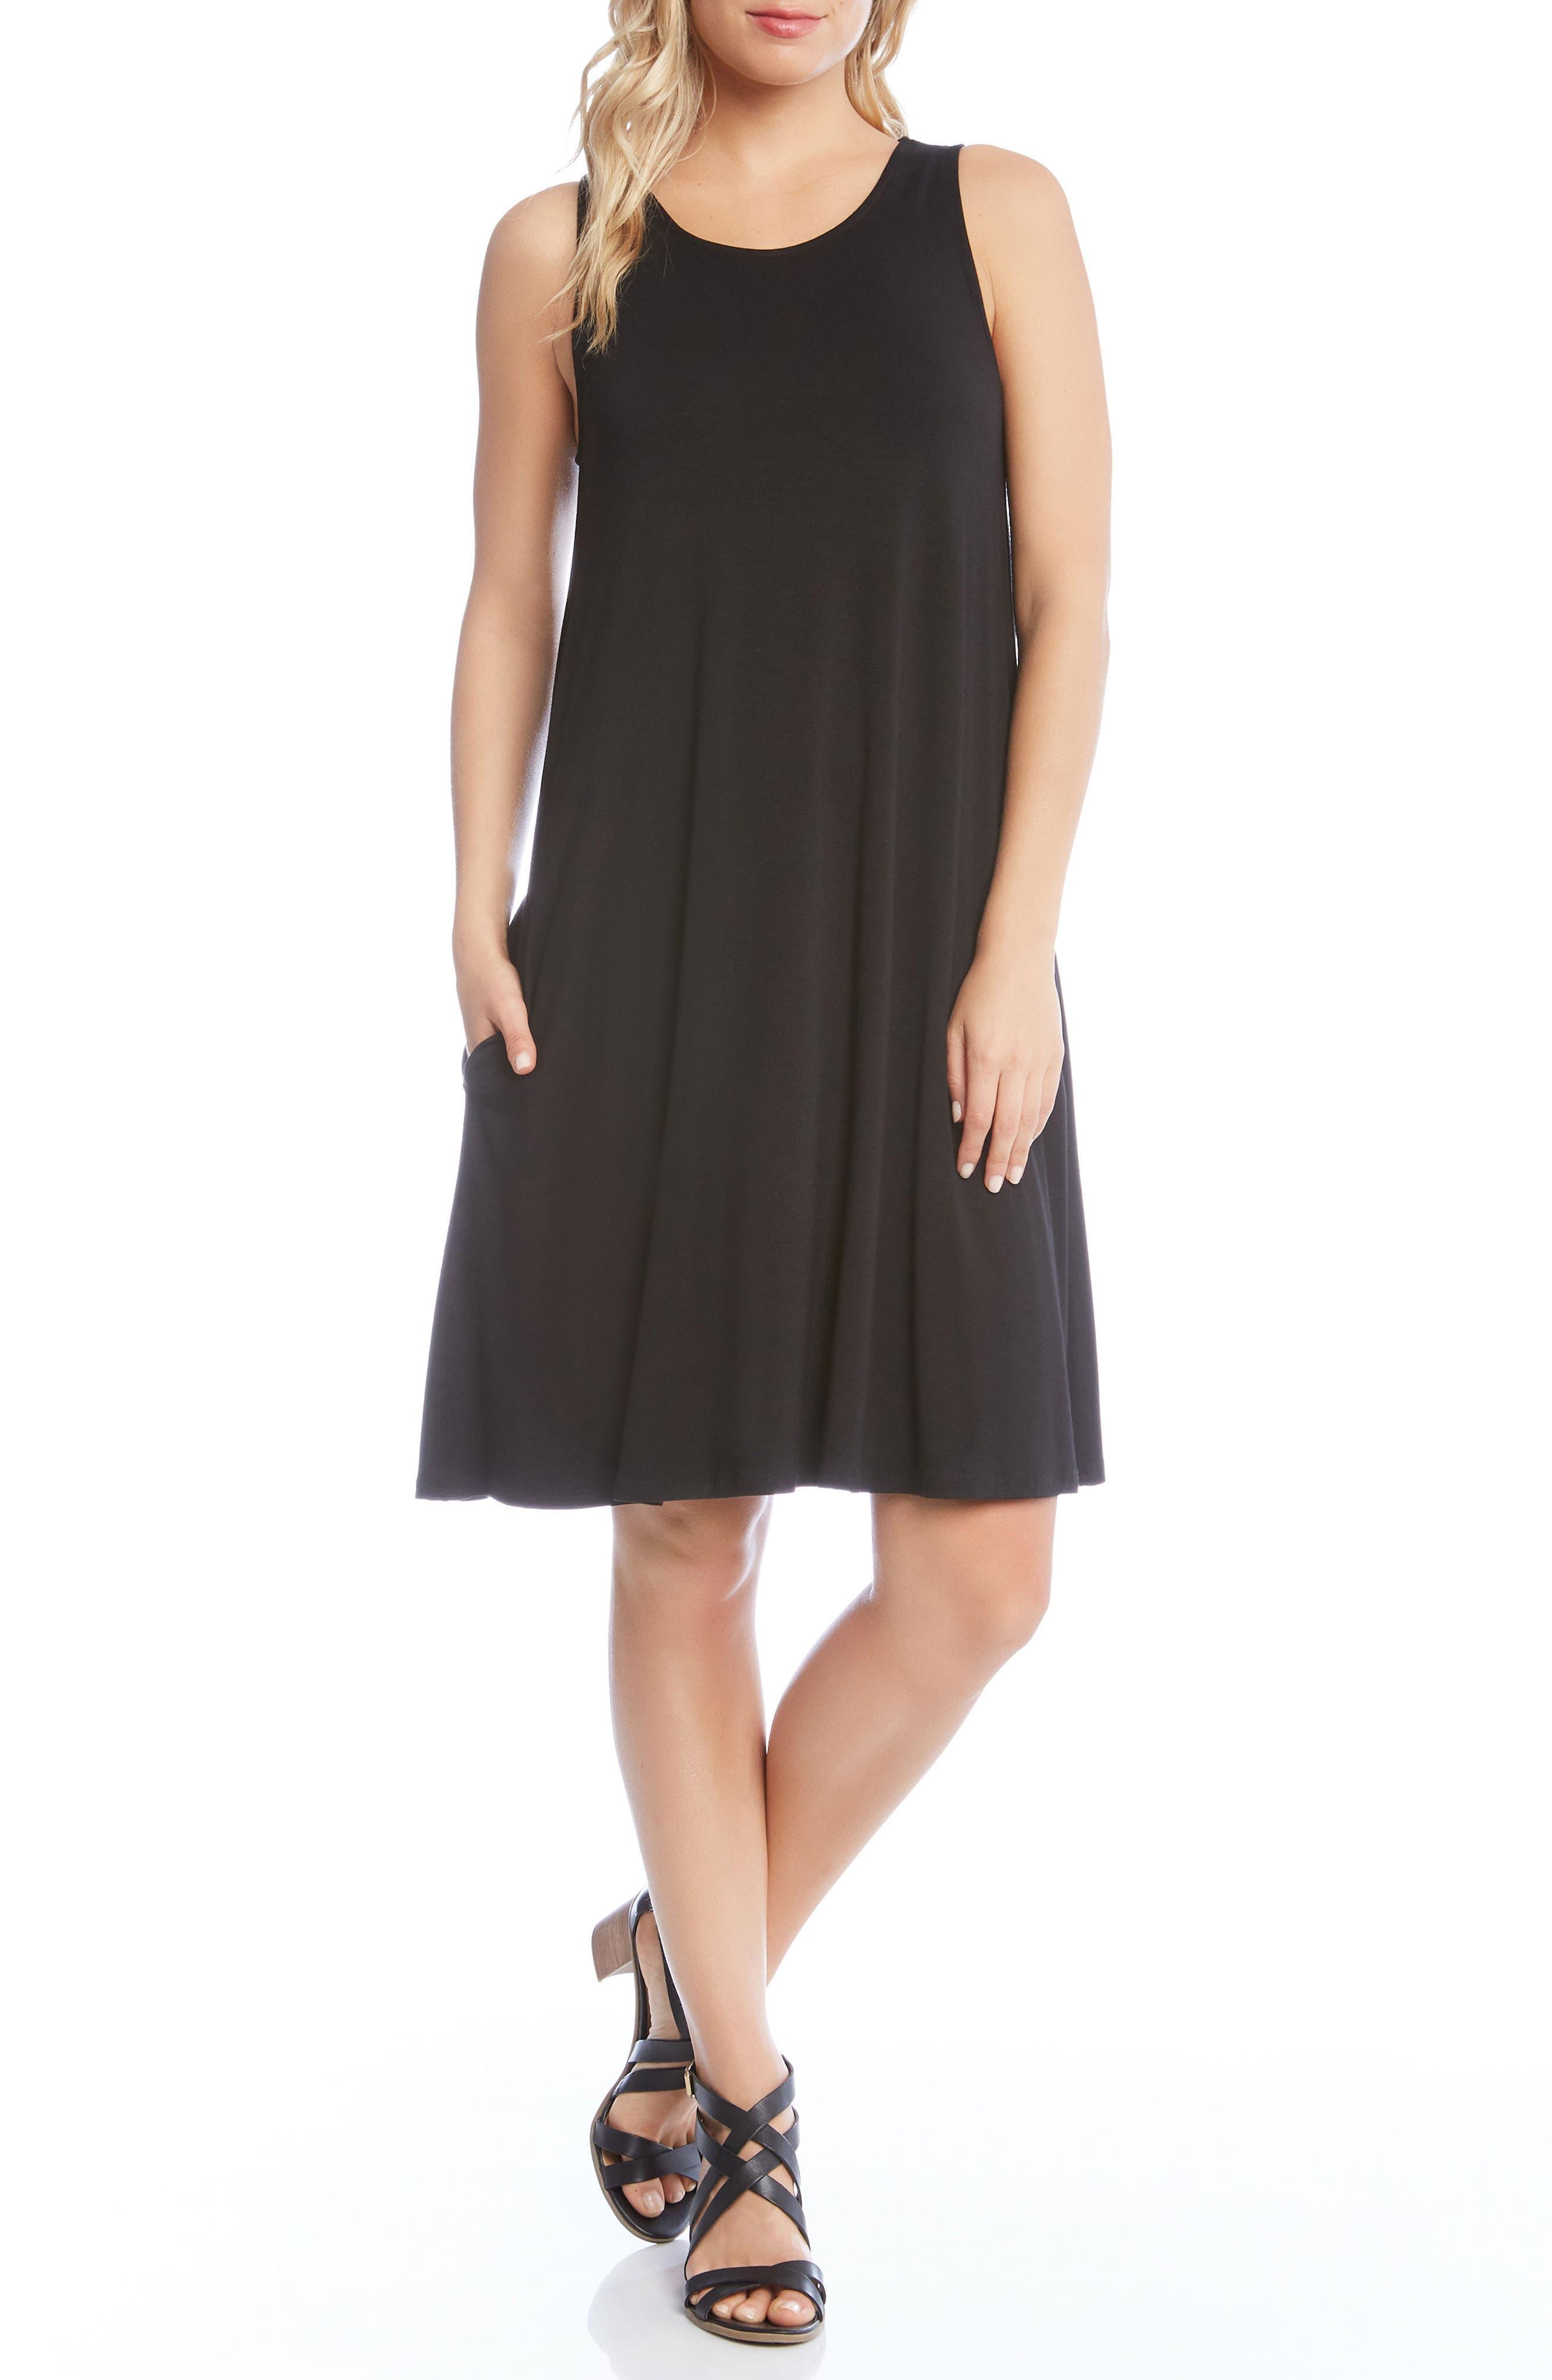 Chloe Swing Jersey Dress,                             Main thumbnail 1, color,                             001